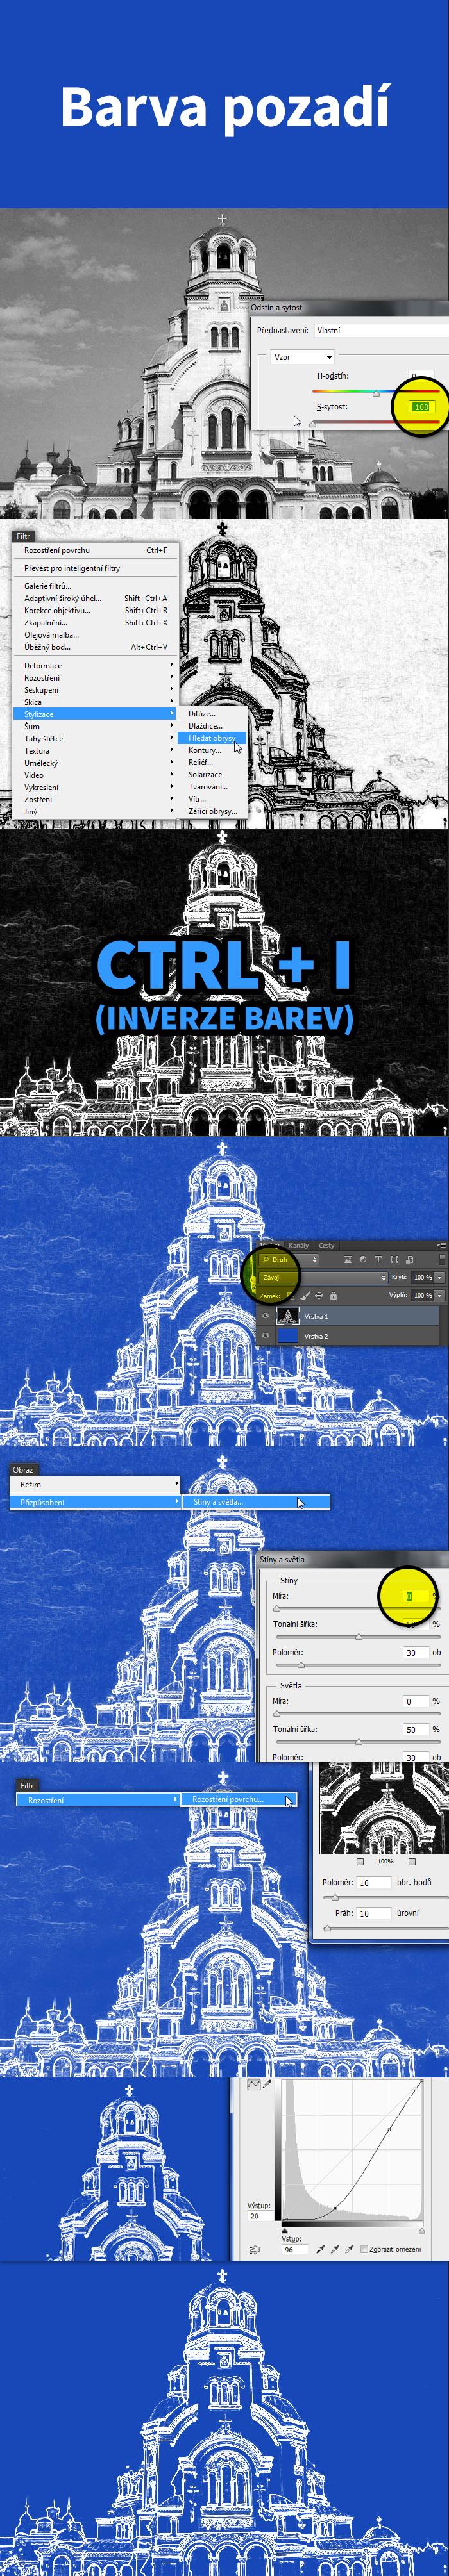 blueprint-postup